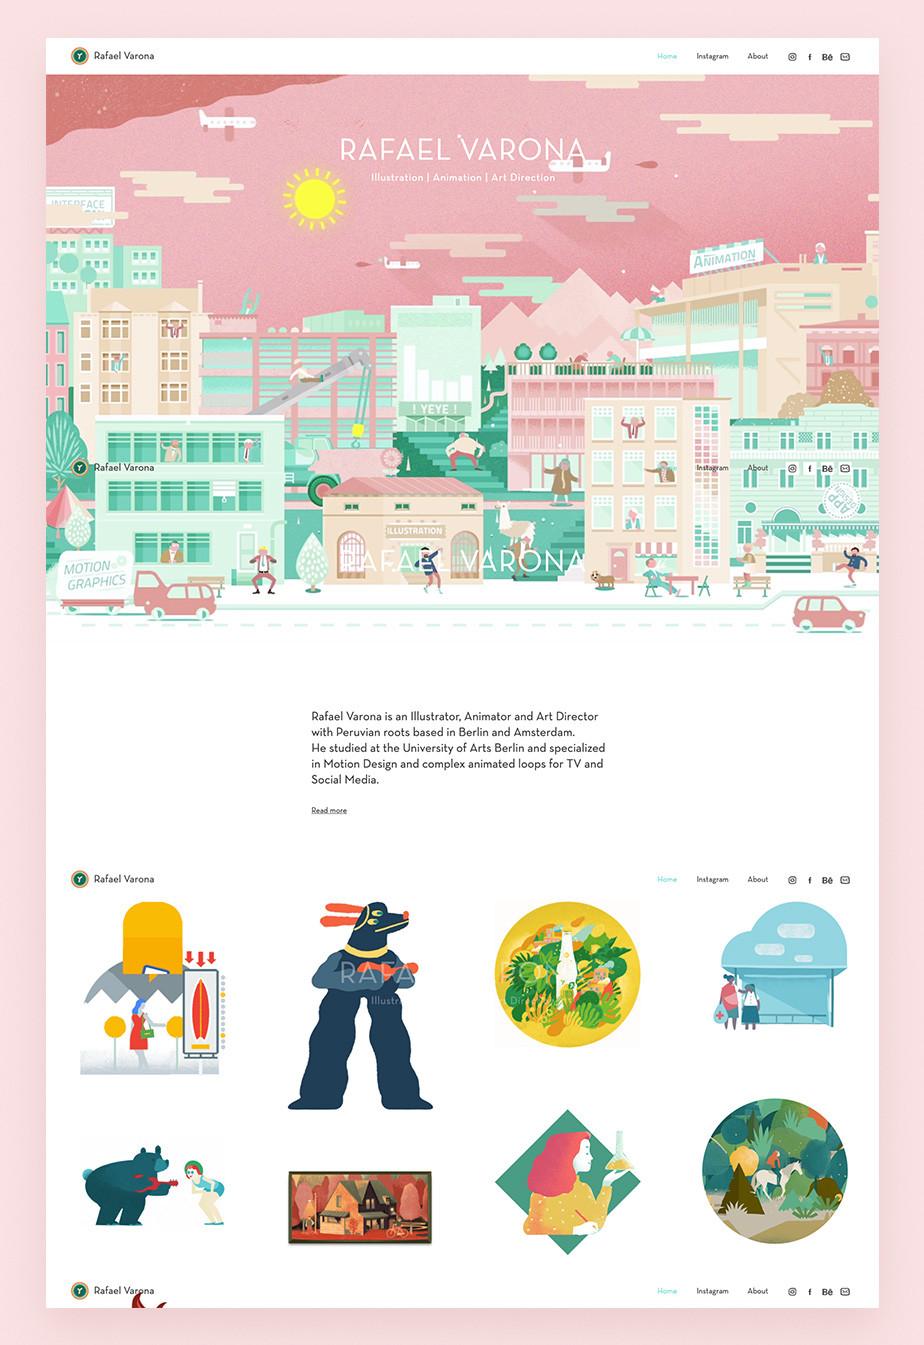 Wix website example by Rafael Varona